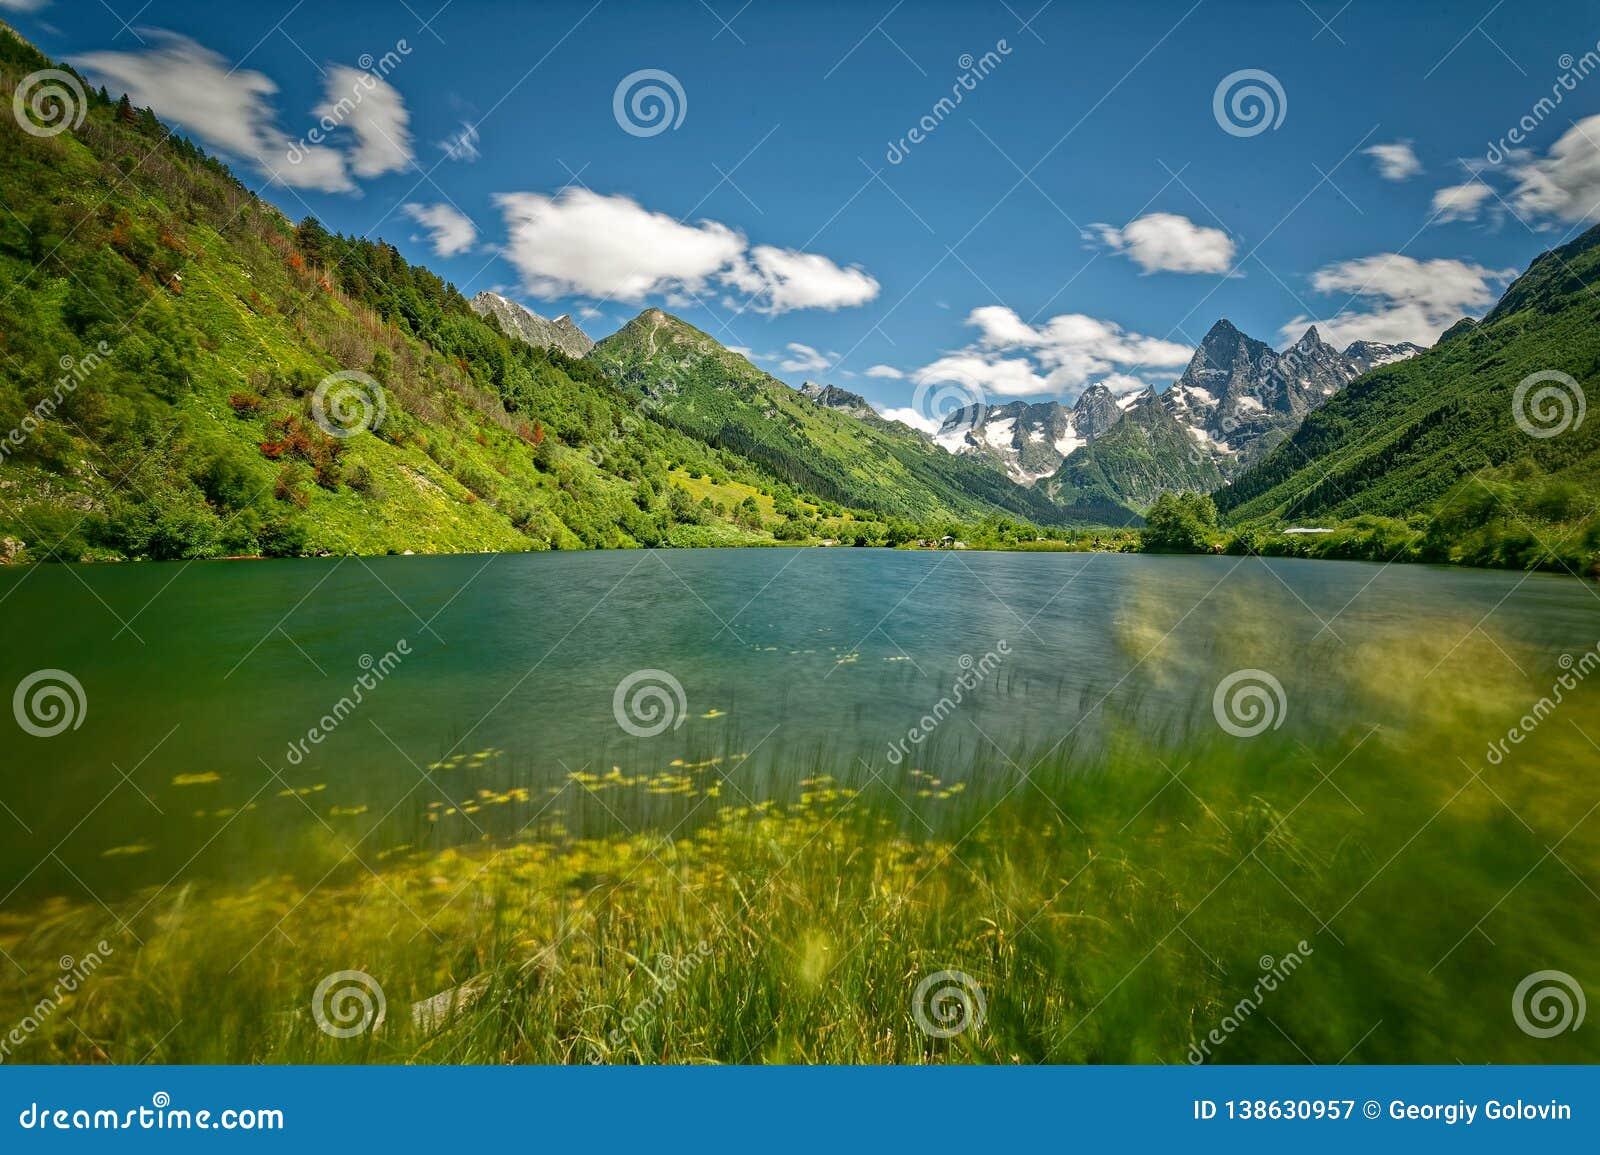 Kaukasus den Karachay-Cherkessia regionen, den Teberda reserven, sjön Tumanly-stelnar